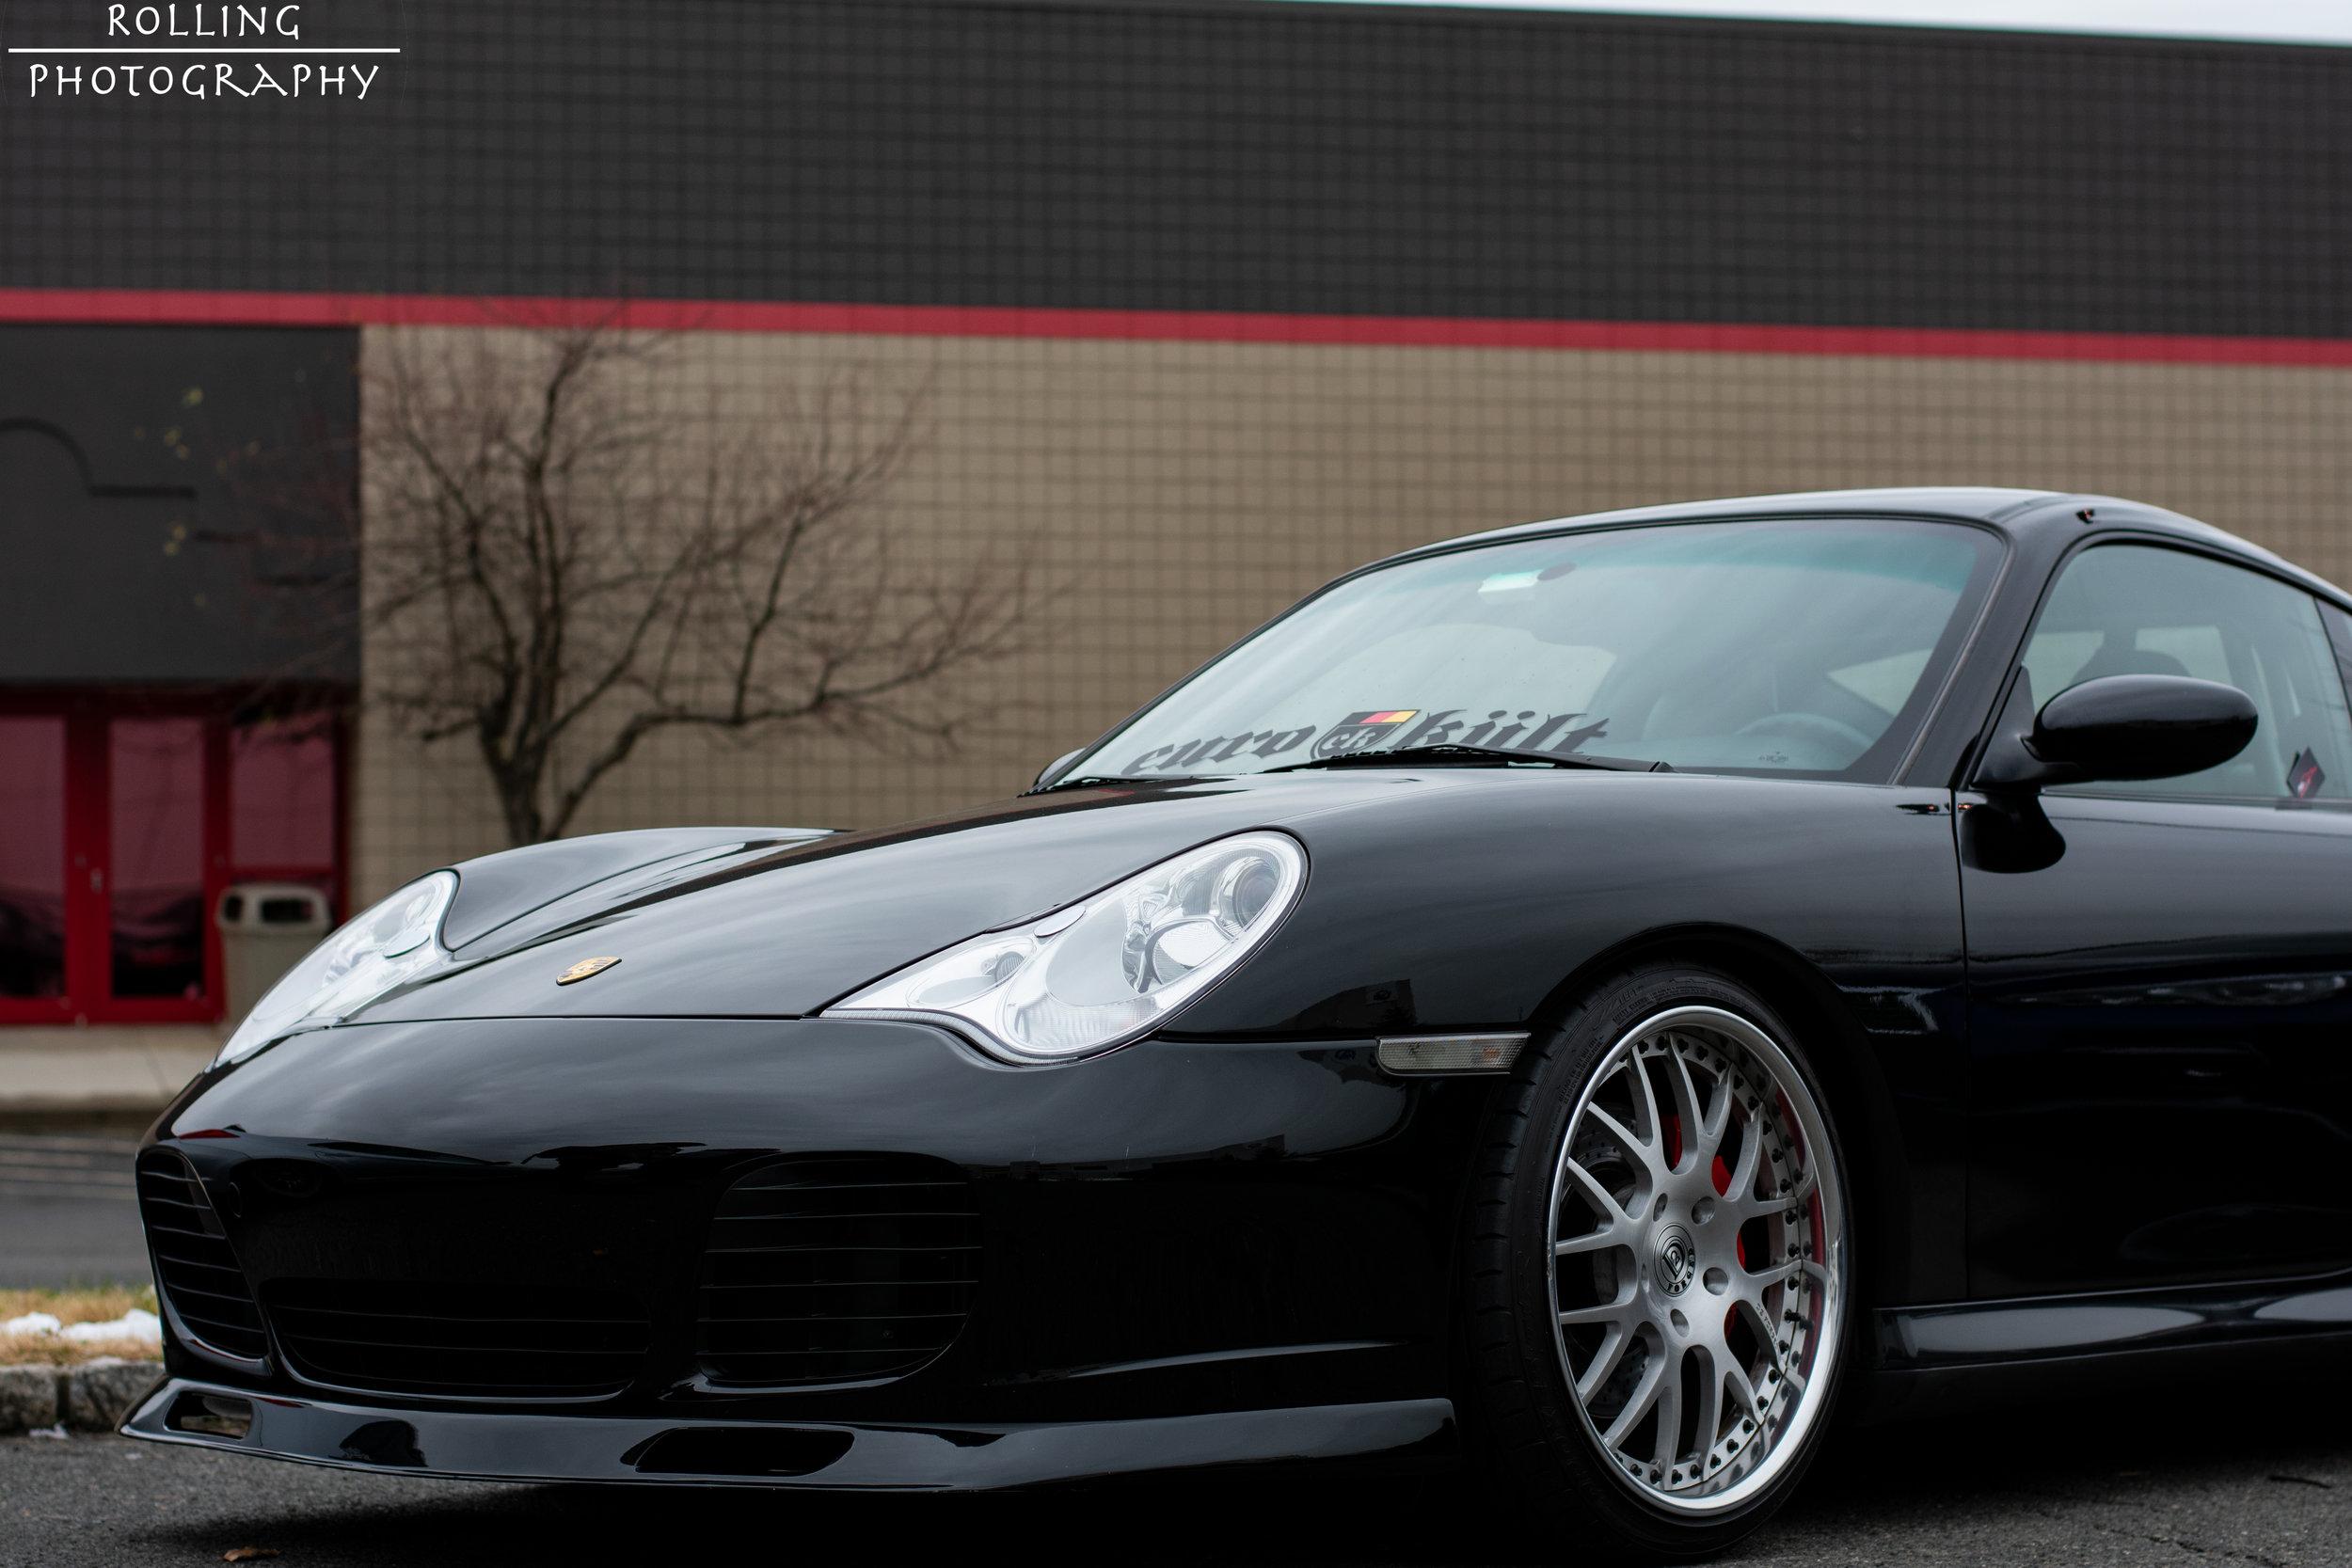 Euro_Kult 911 Turbo Front Angle.jpg